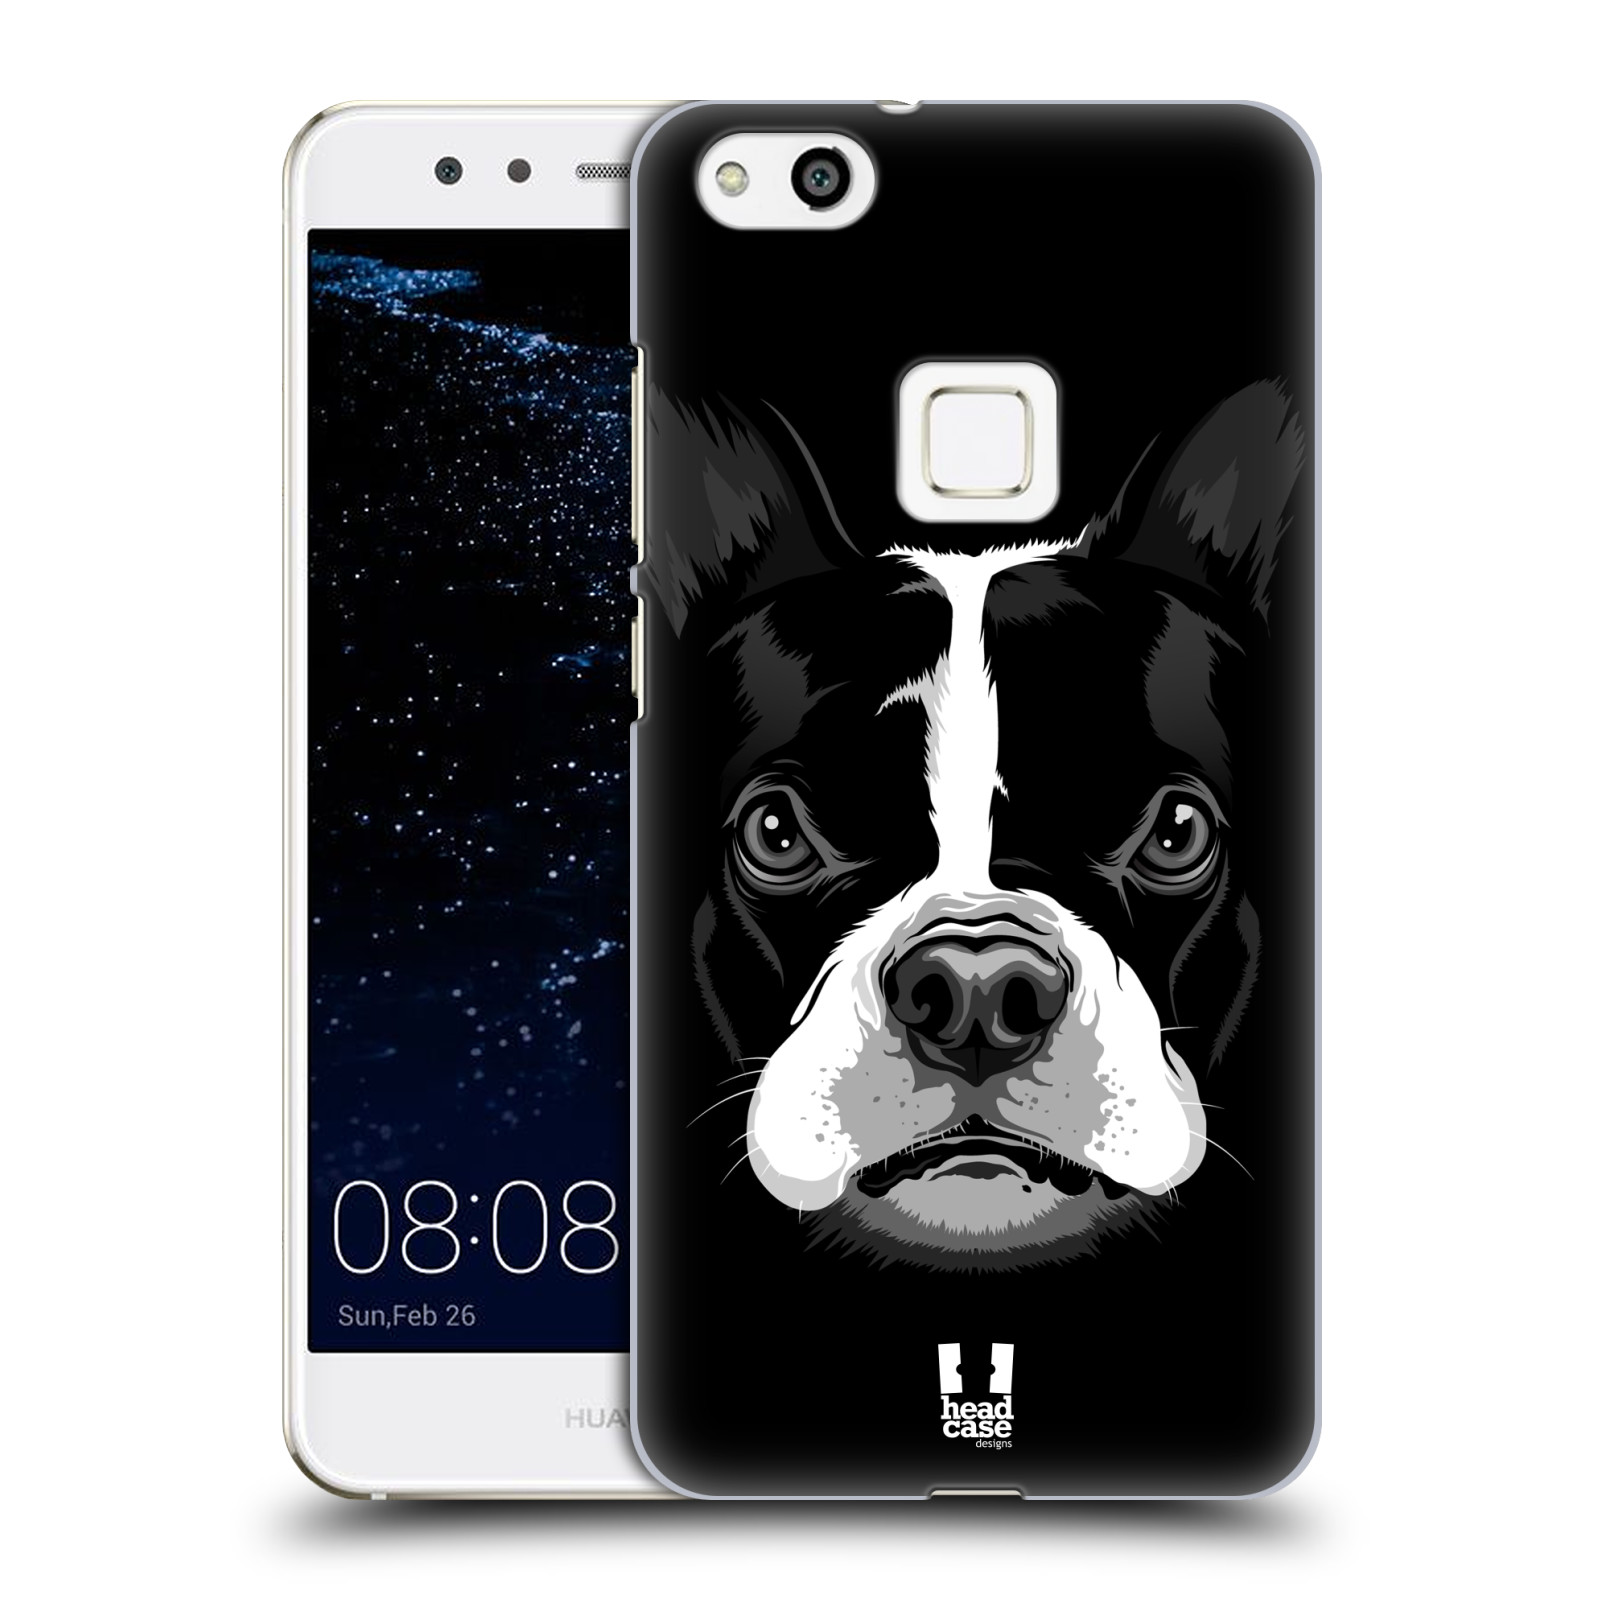 Plastové pouzdro na mobil Huawei P10 Lite Head Case - ILUSTROVANÝ BULDOČEK (Plastový kryt či obal na mobilní telefon Huawei P10 Lite Dual SIM (LX1/LX1A))